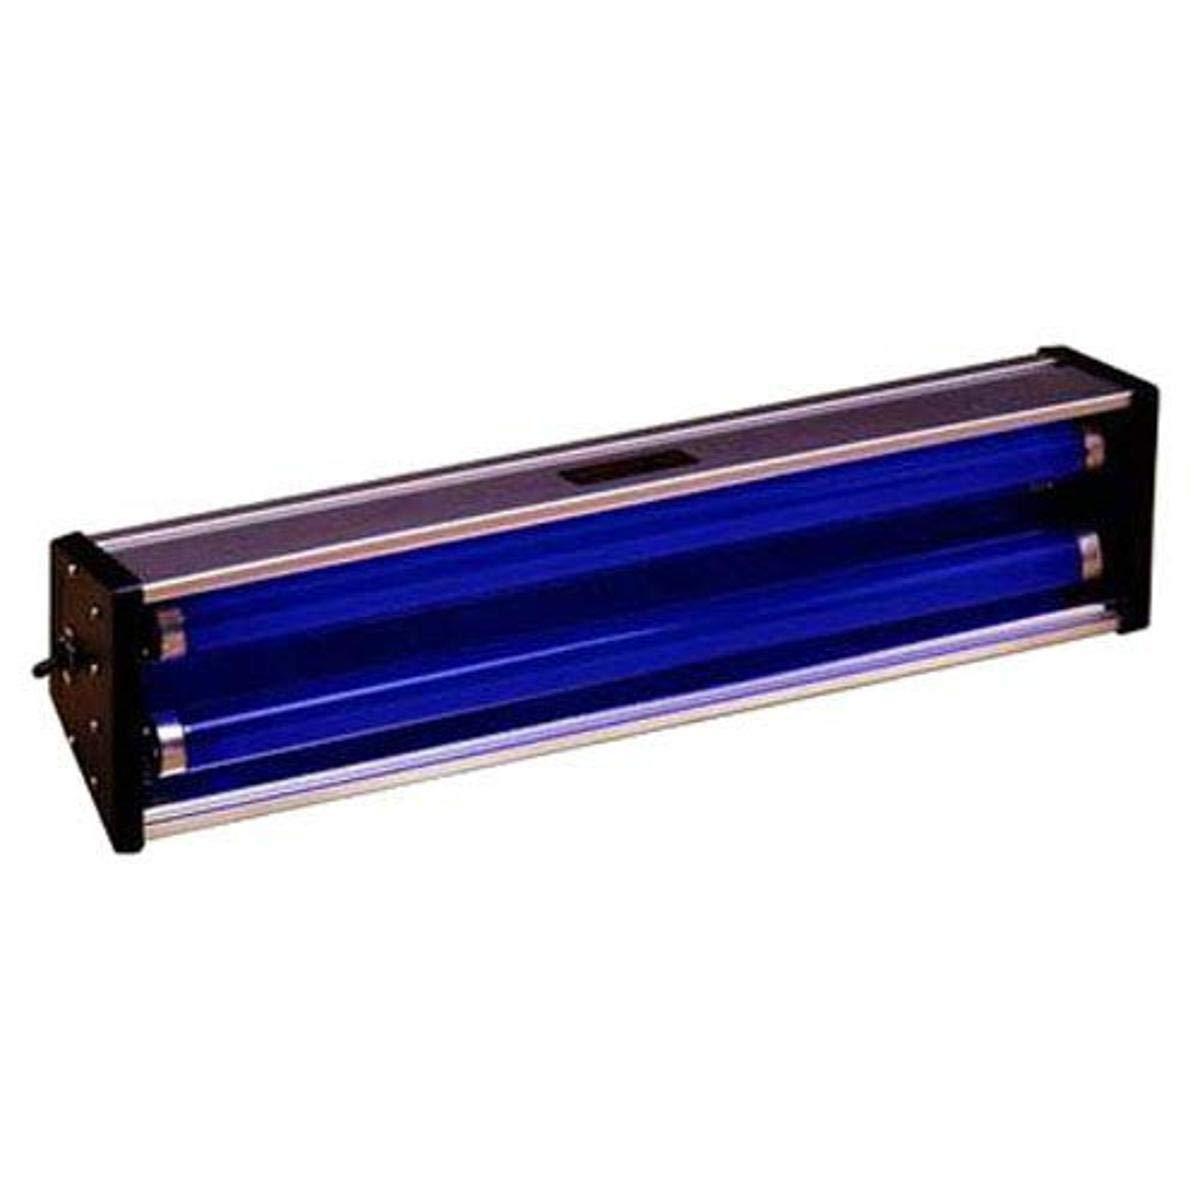 Spectronics XX-15A UV Lamp trend rank 365nm 2 BLB x Time sale Tubes 120V 15W